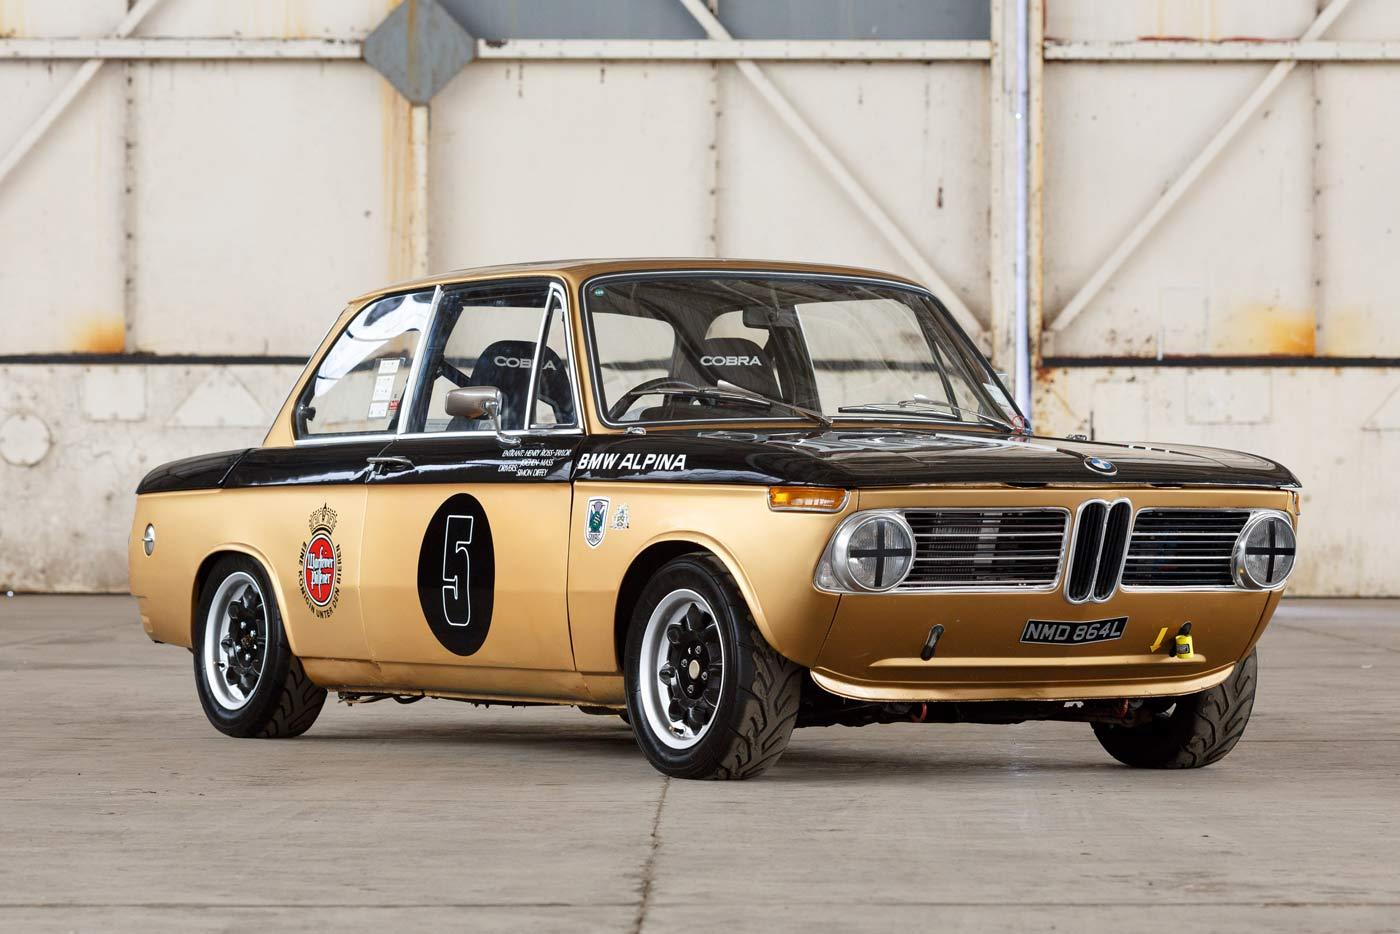 Classic Car Find of the Week: 1972 BMW 2002 Race Car - OPUMO Magazine